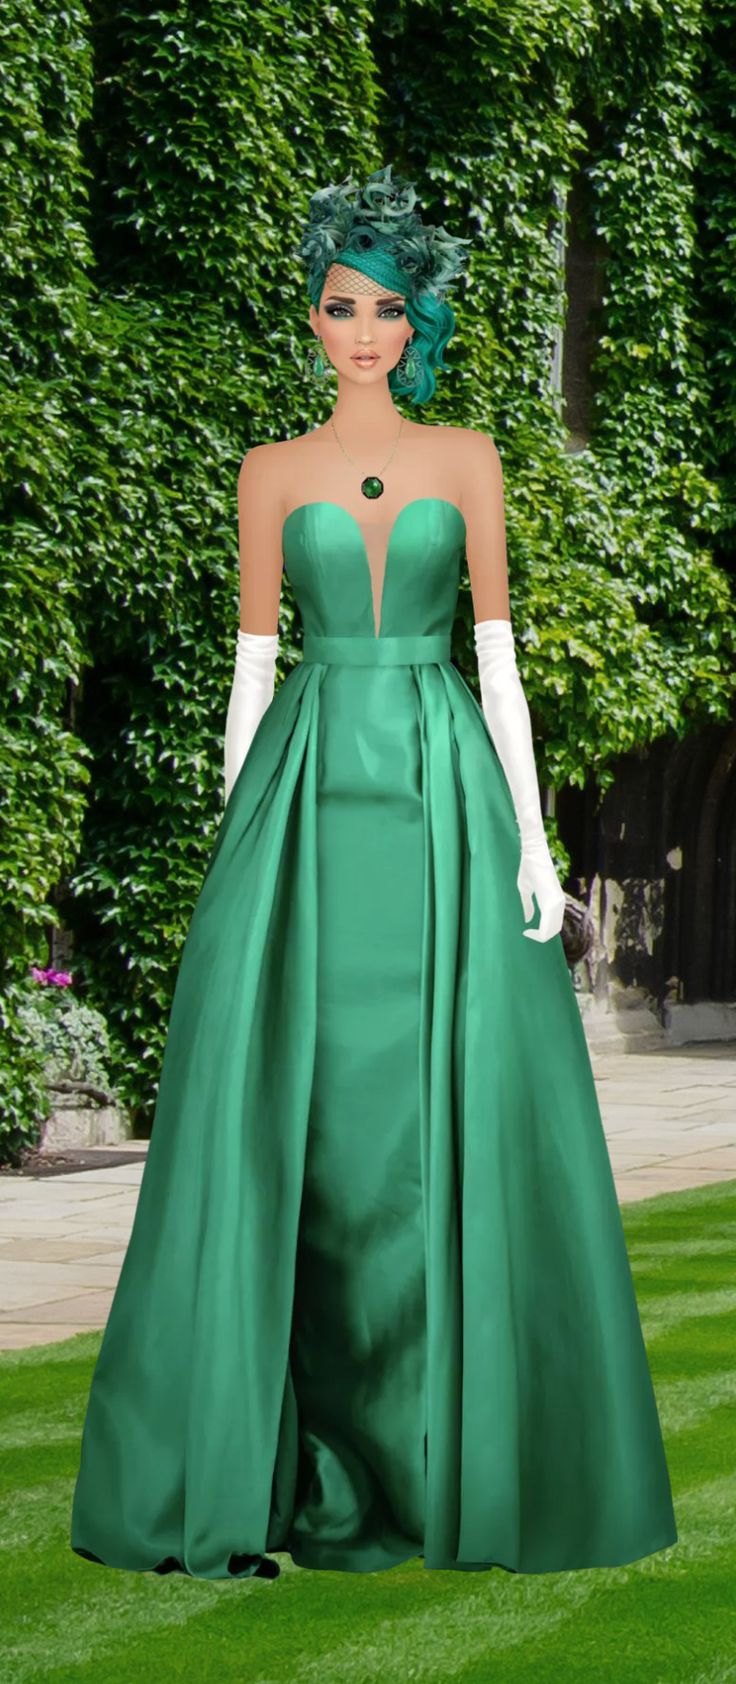 best weddings images on pinterest wedding dressses marriage